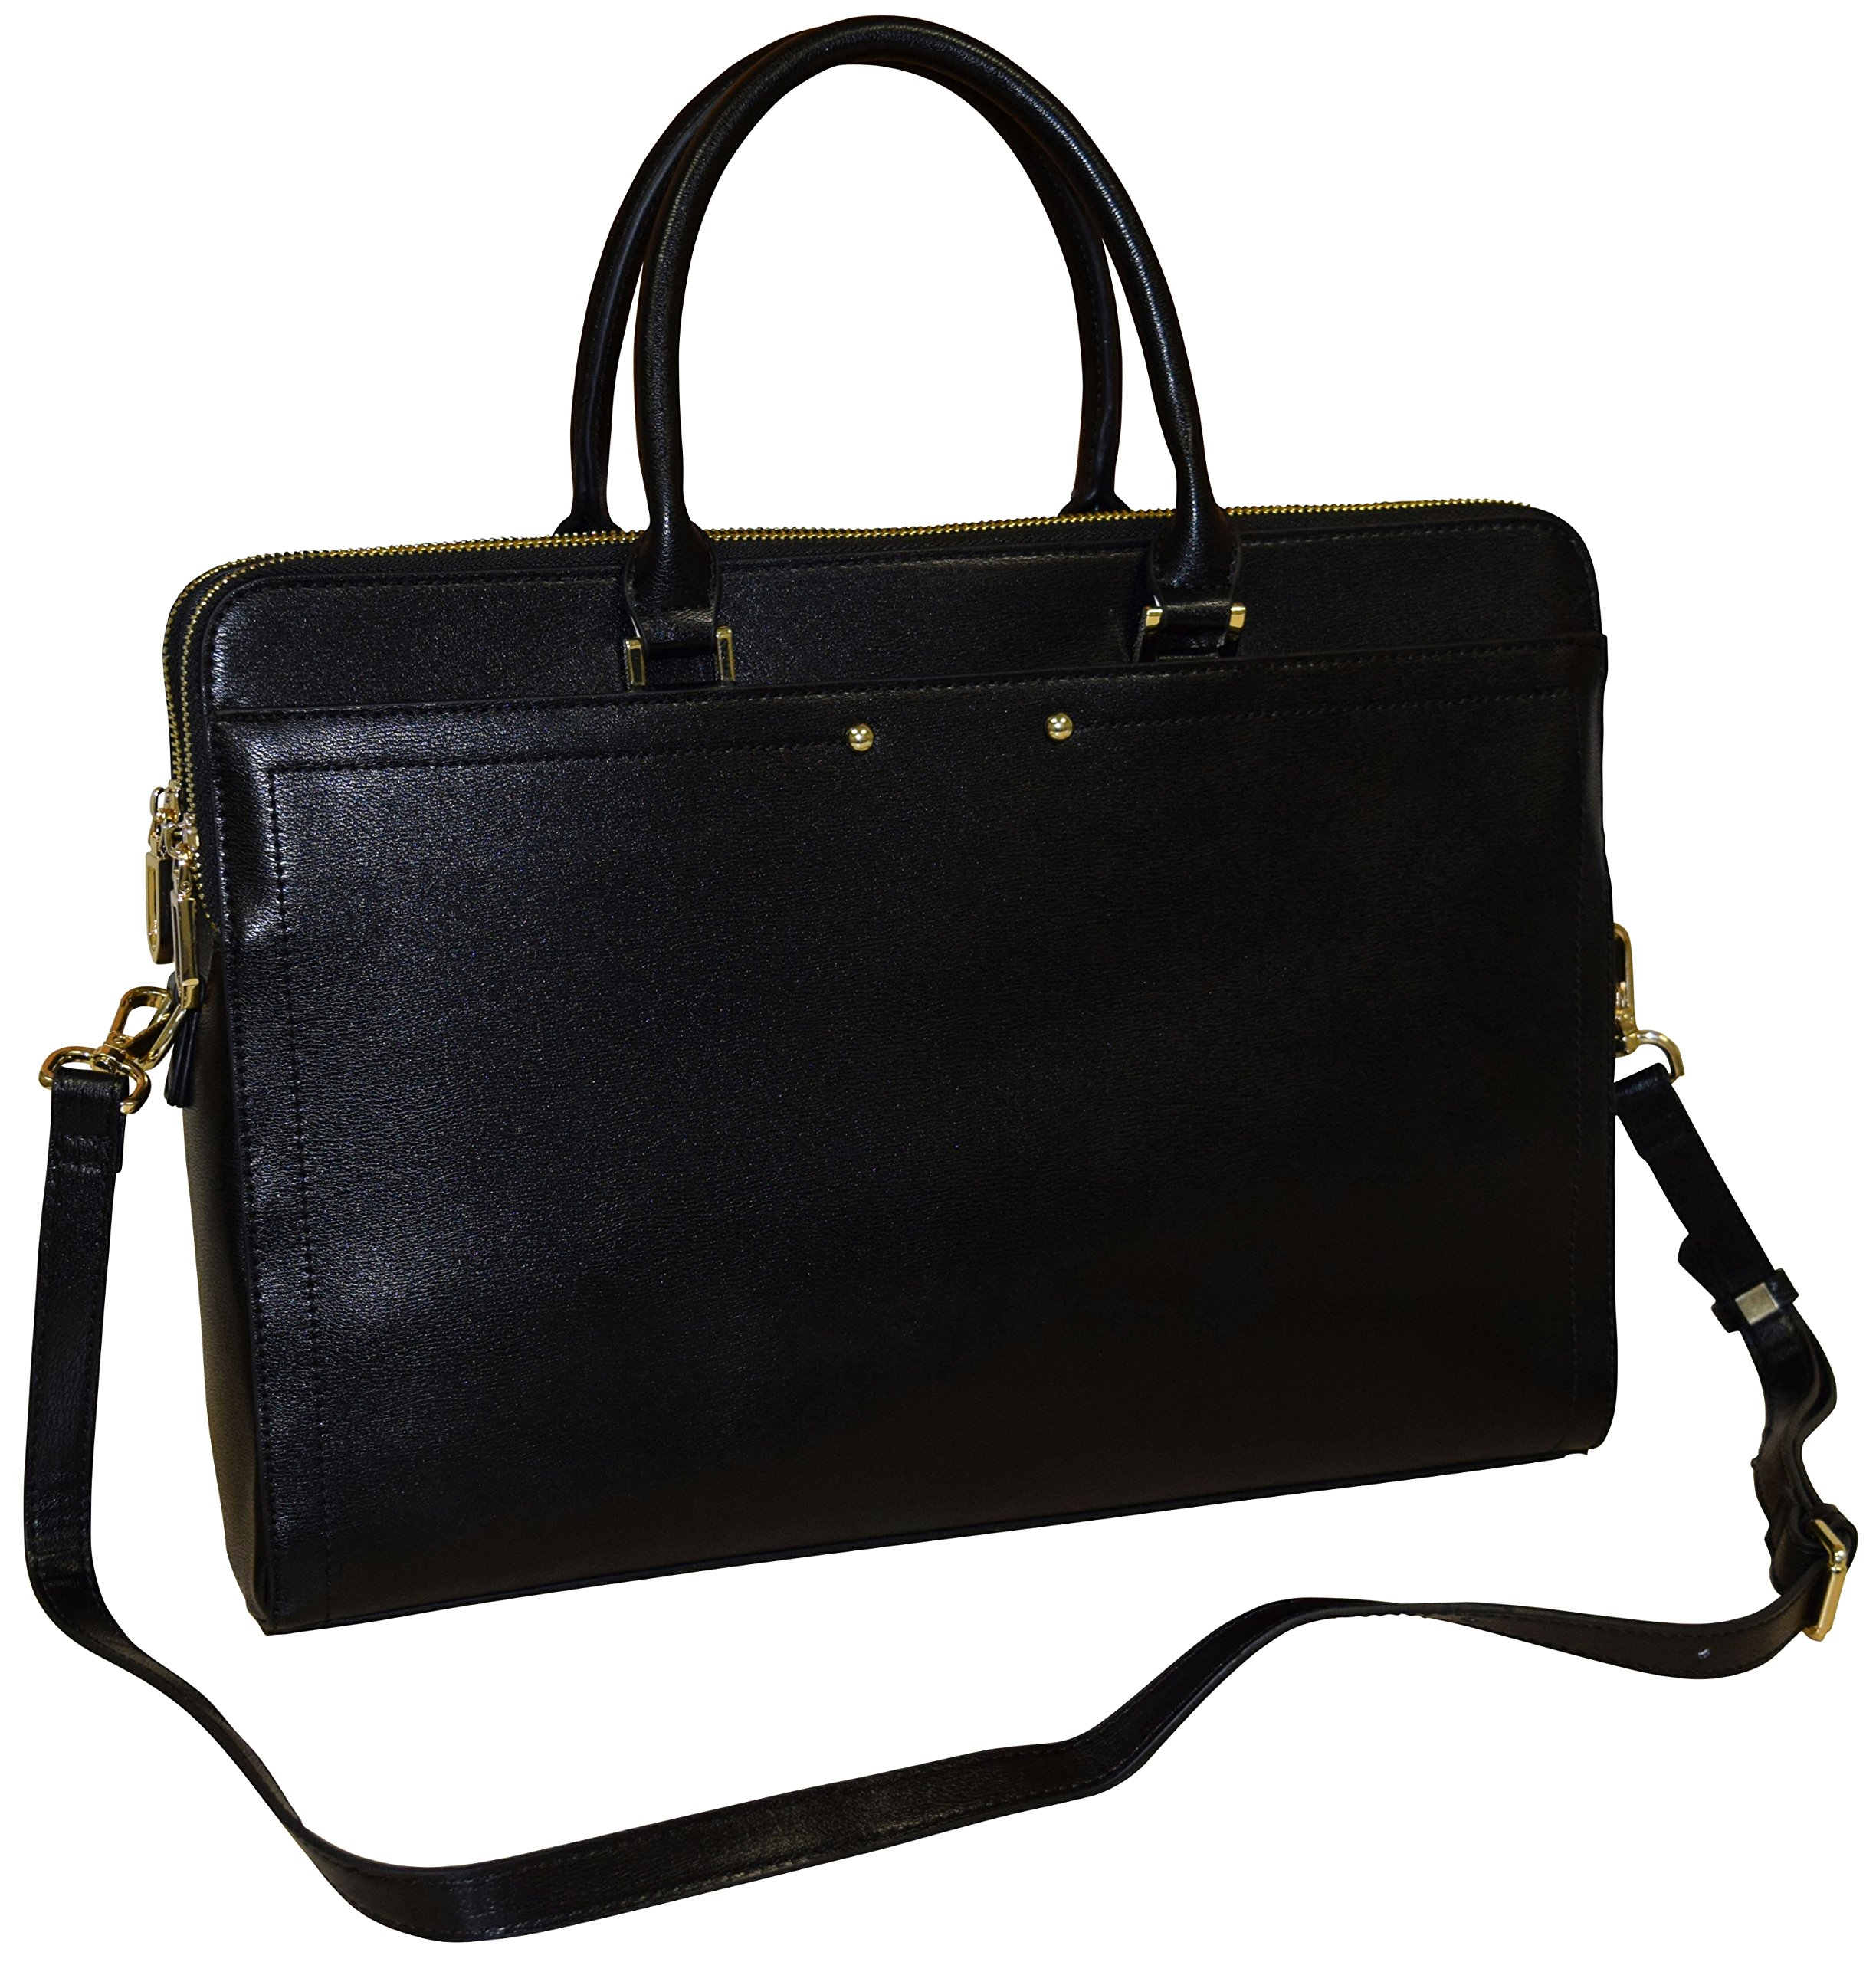 KQ New York Women's 15.5'' Notebook Satchel Shoulder Bag - Carryall Messenger Business Briefcase With Laptop Pocket (Black )